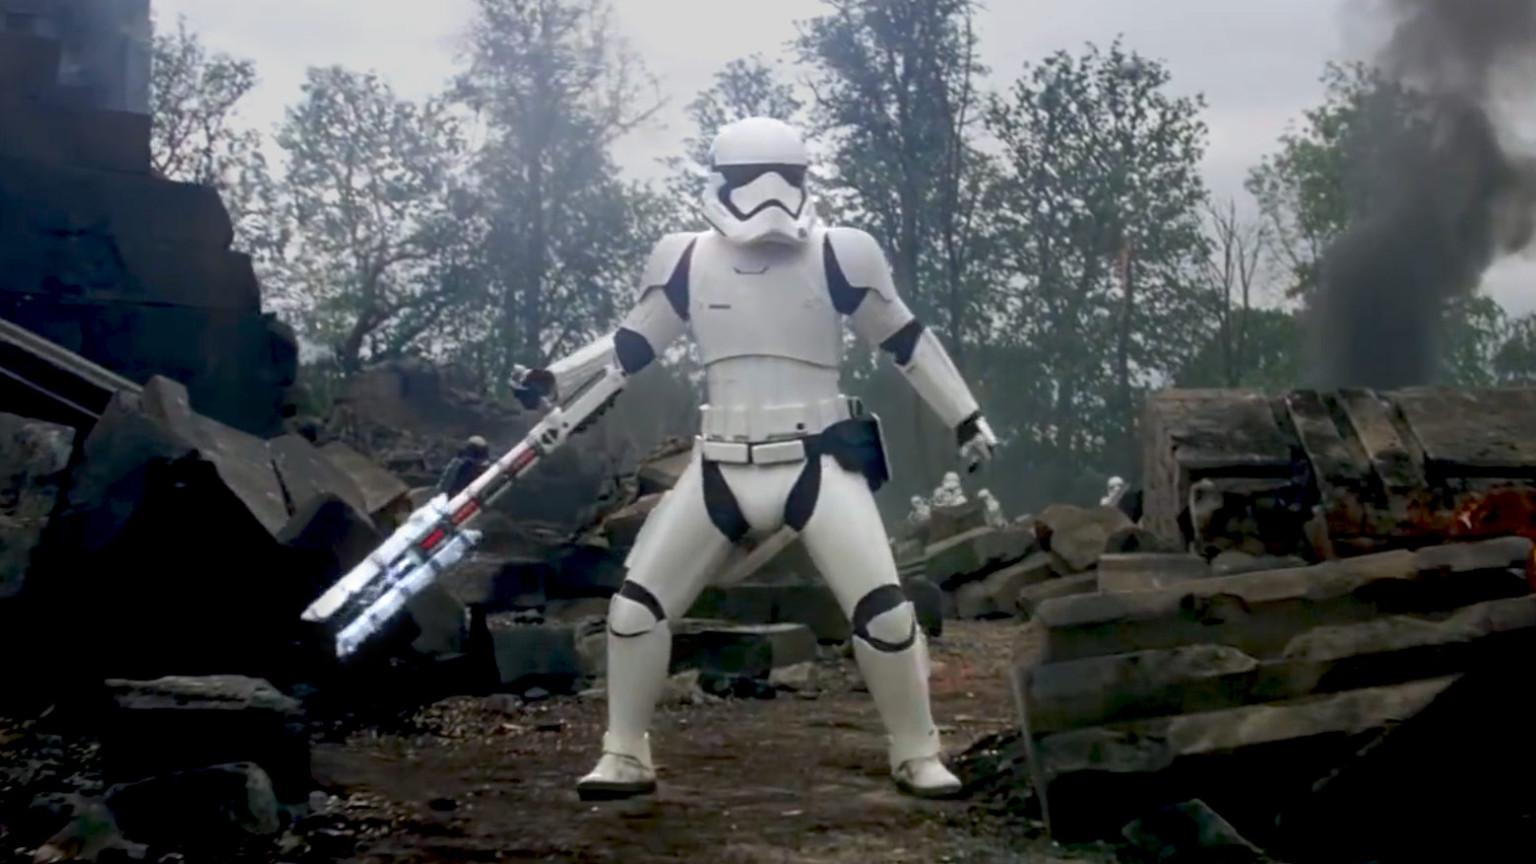 FN-2199 stormtrooper